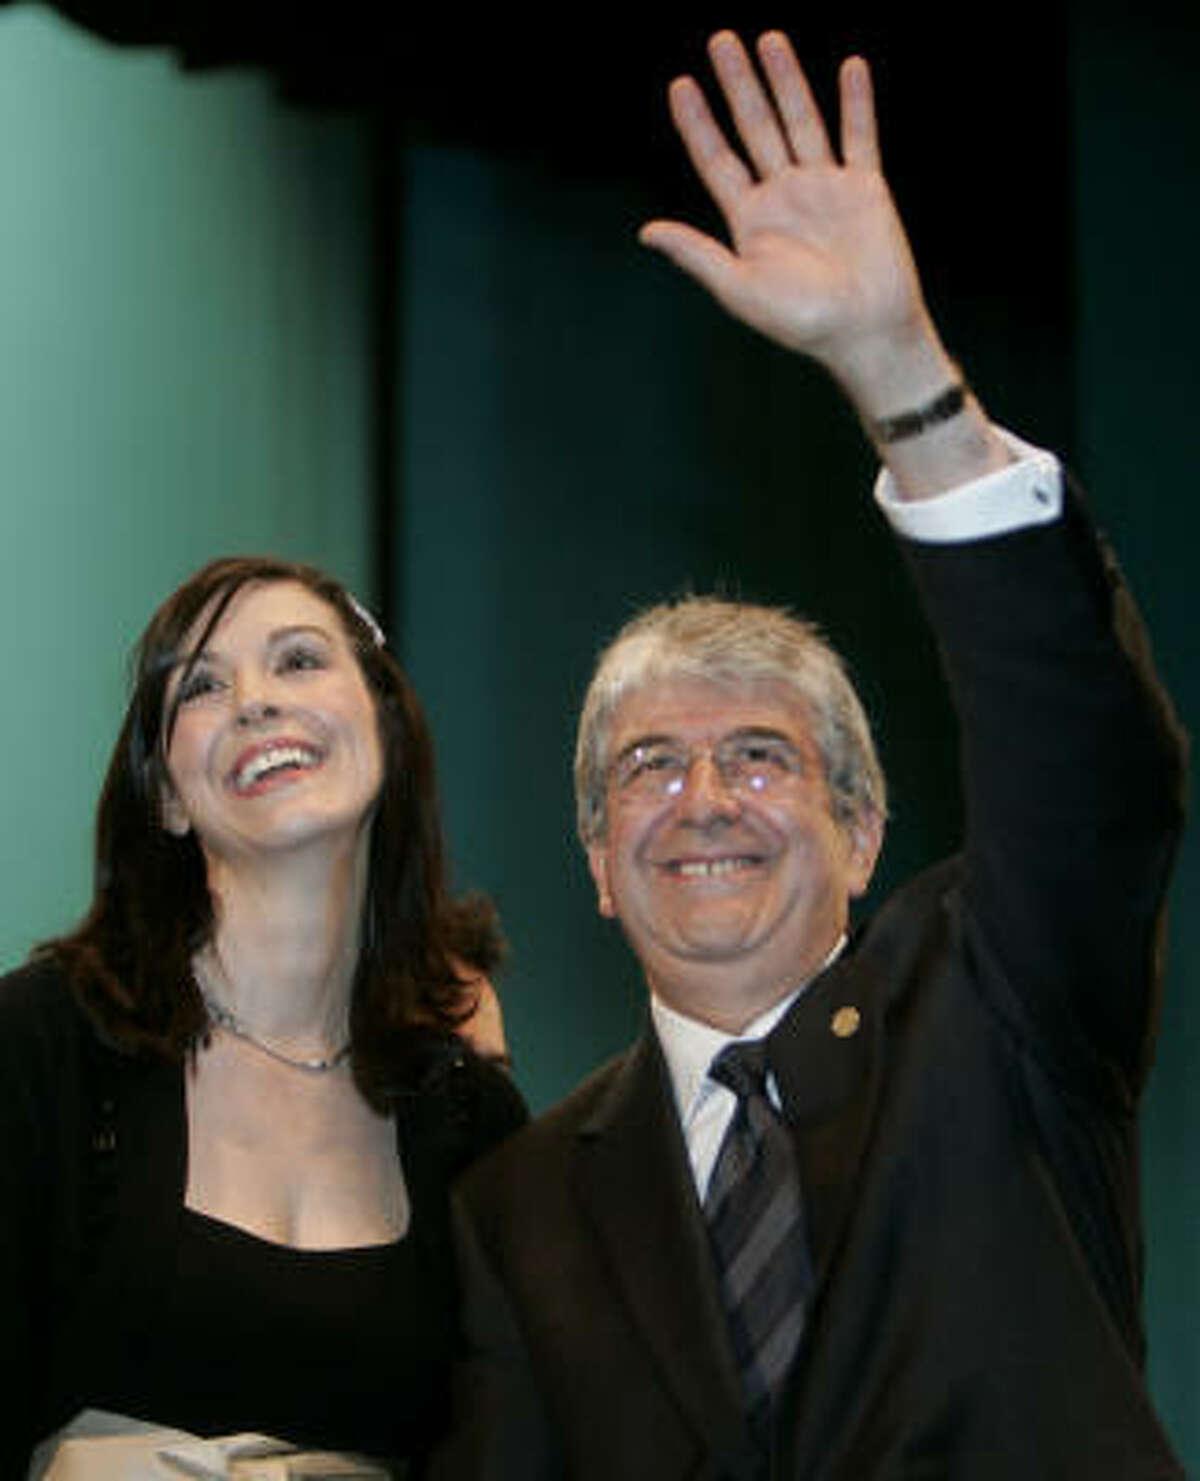 Espada waves to supporters with his daughter, Maria Olga Espada.